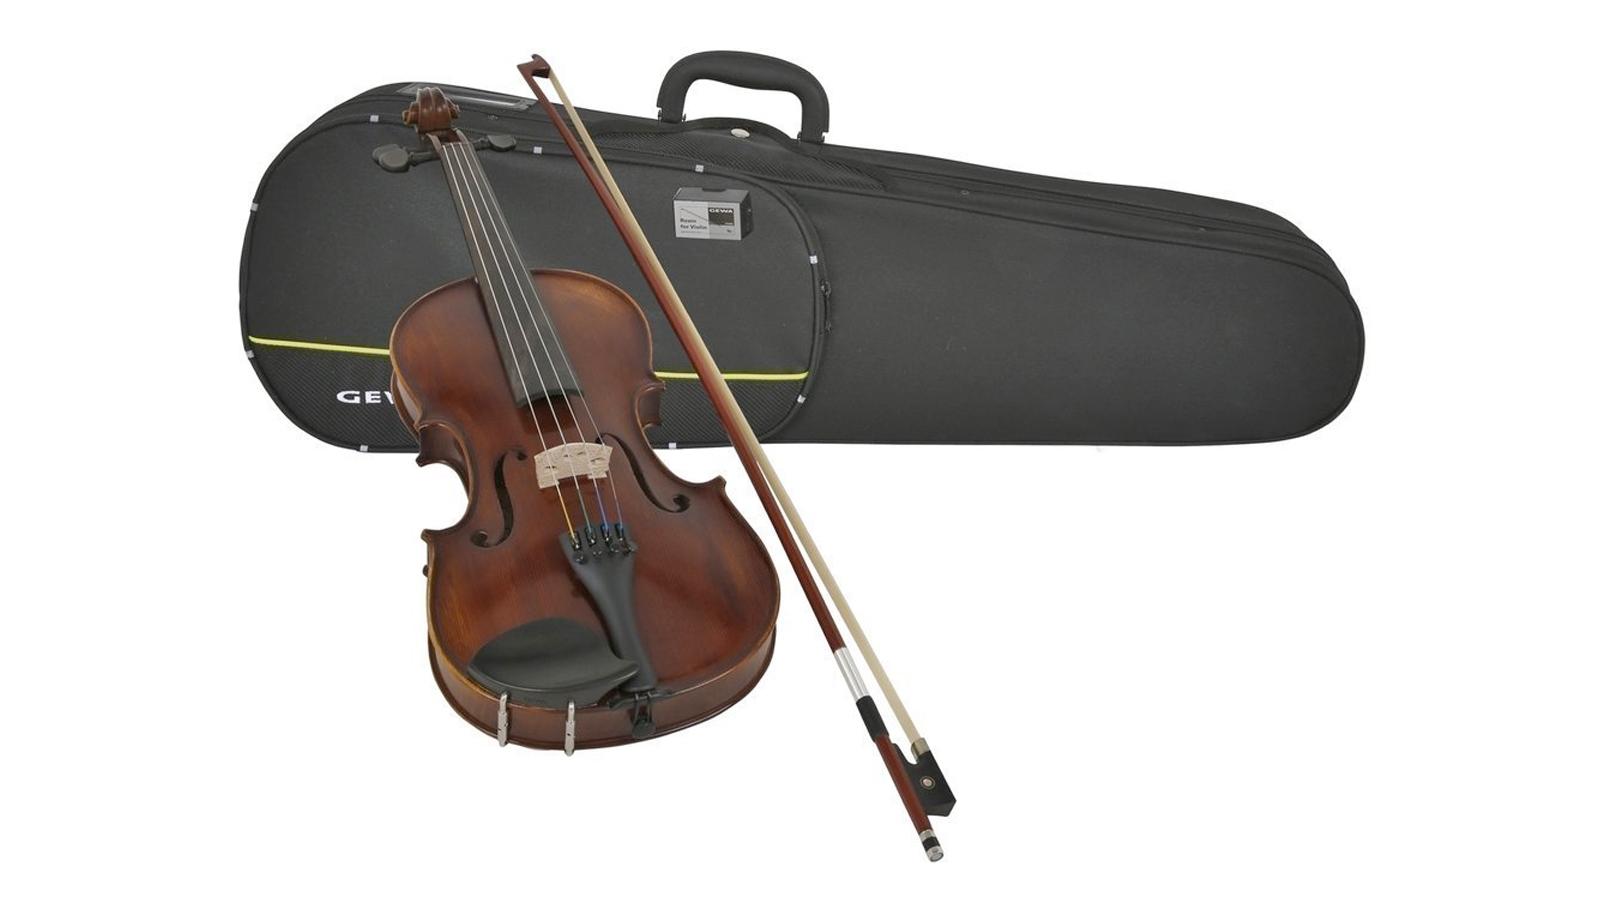 Gewa Aspirante Violingarnitur York 4/4